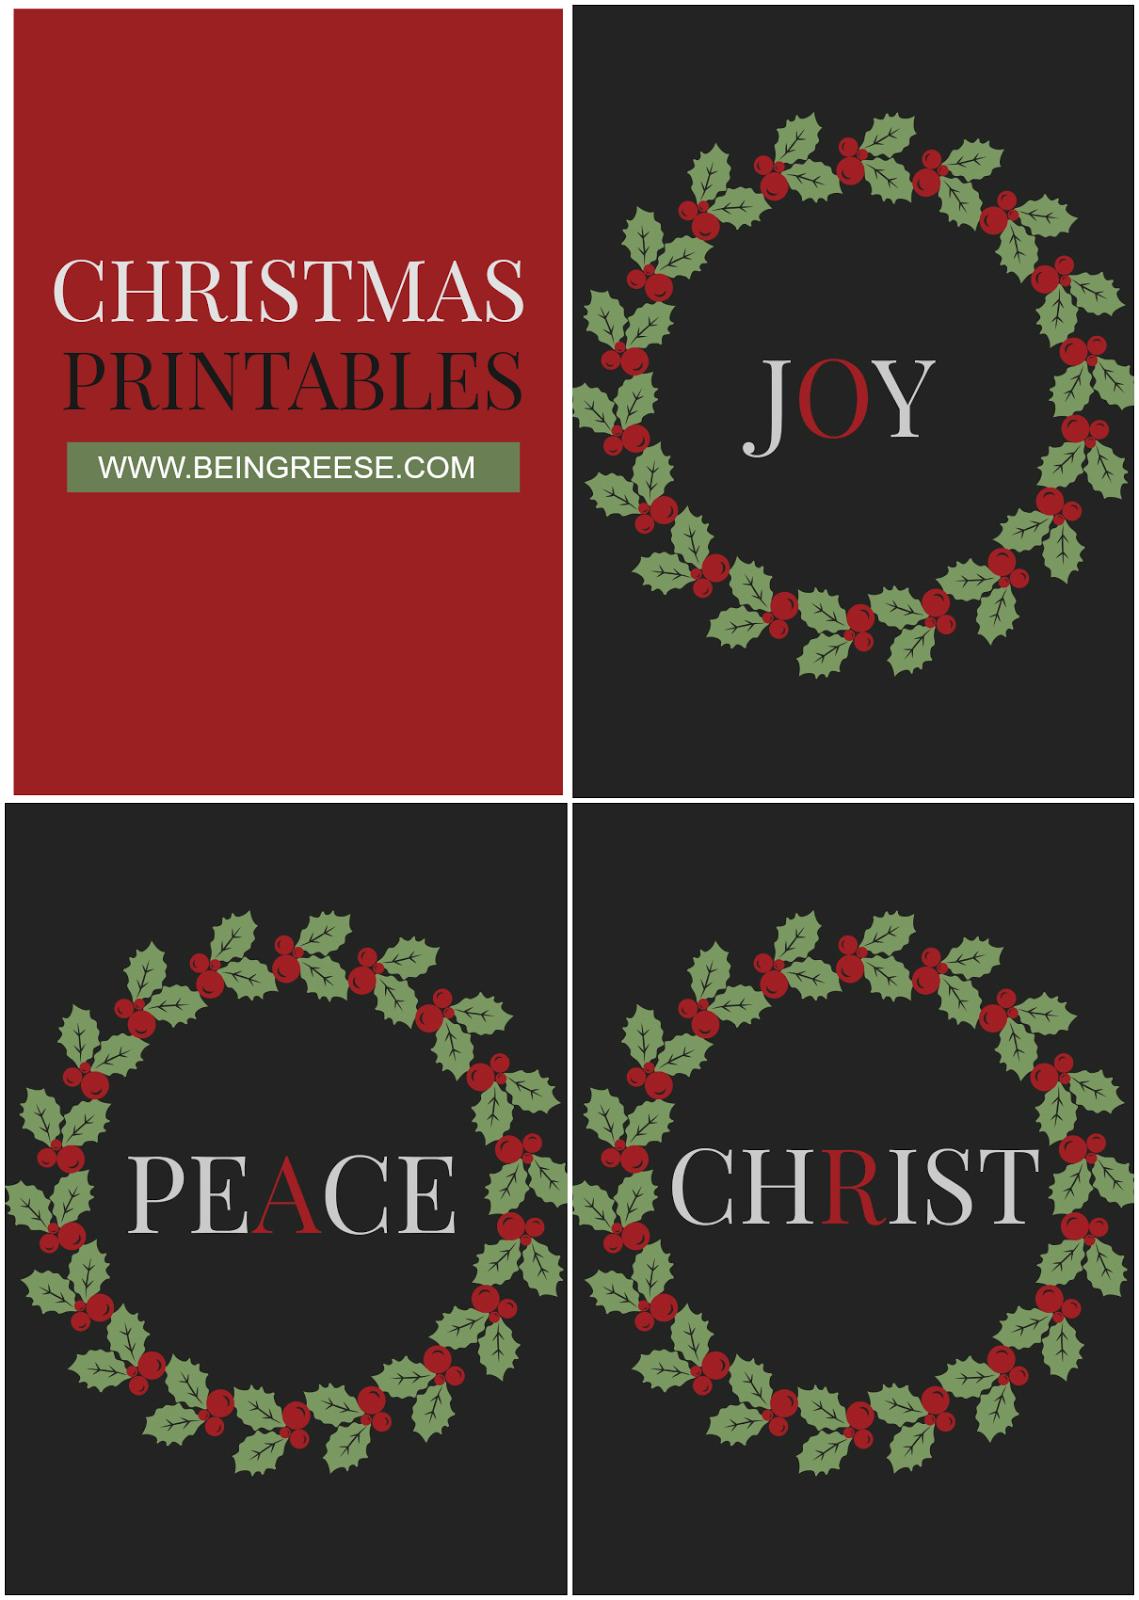 Festive Christmas Printables Set Of 3